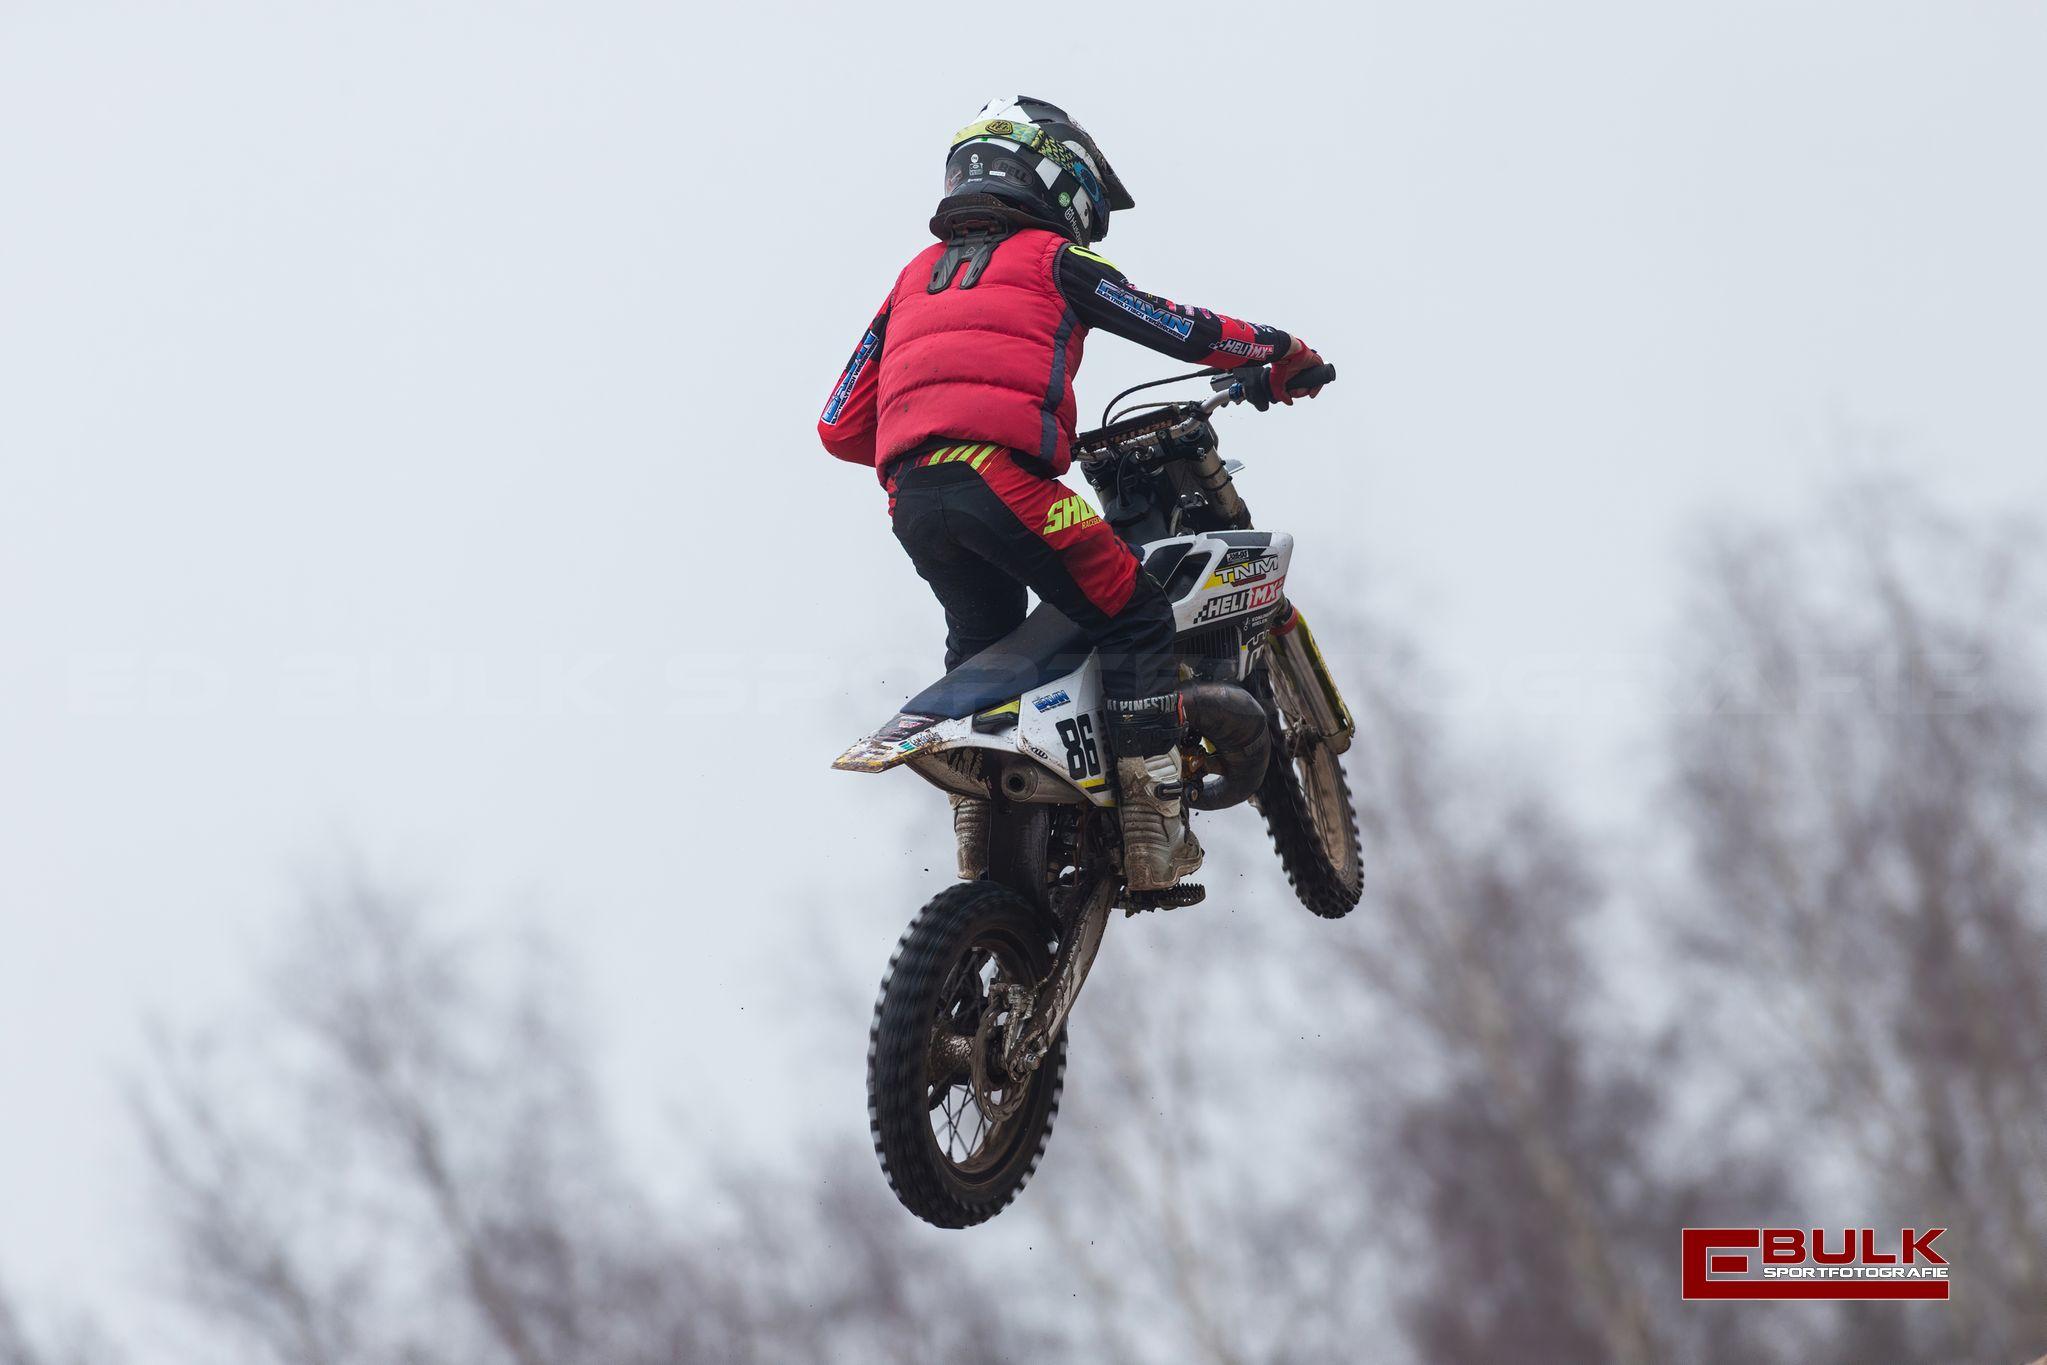 eebs0046-de-ed_bulk_sportfotografie